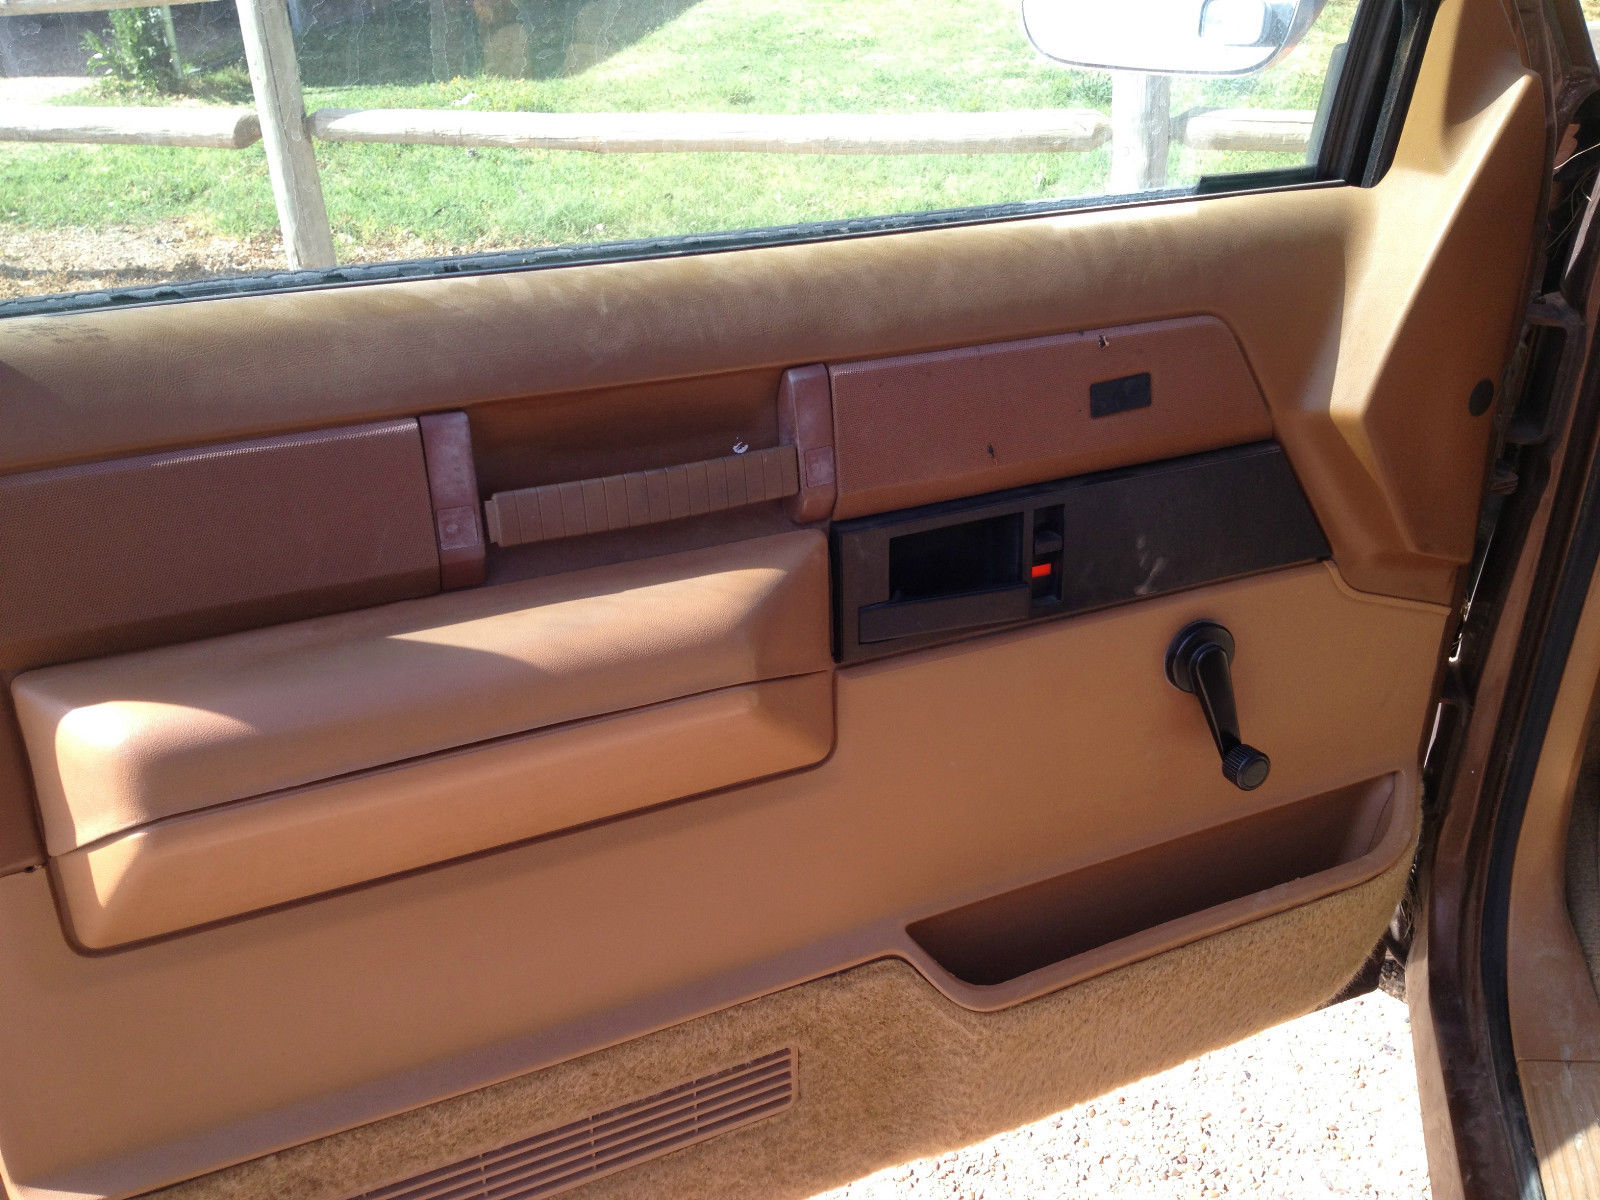 1989 Chevy Silverado 1500 C K1500 Pickup Truck Chevrolet 5 0 L Fleetside Swb